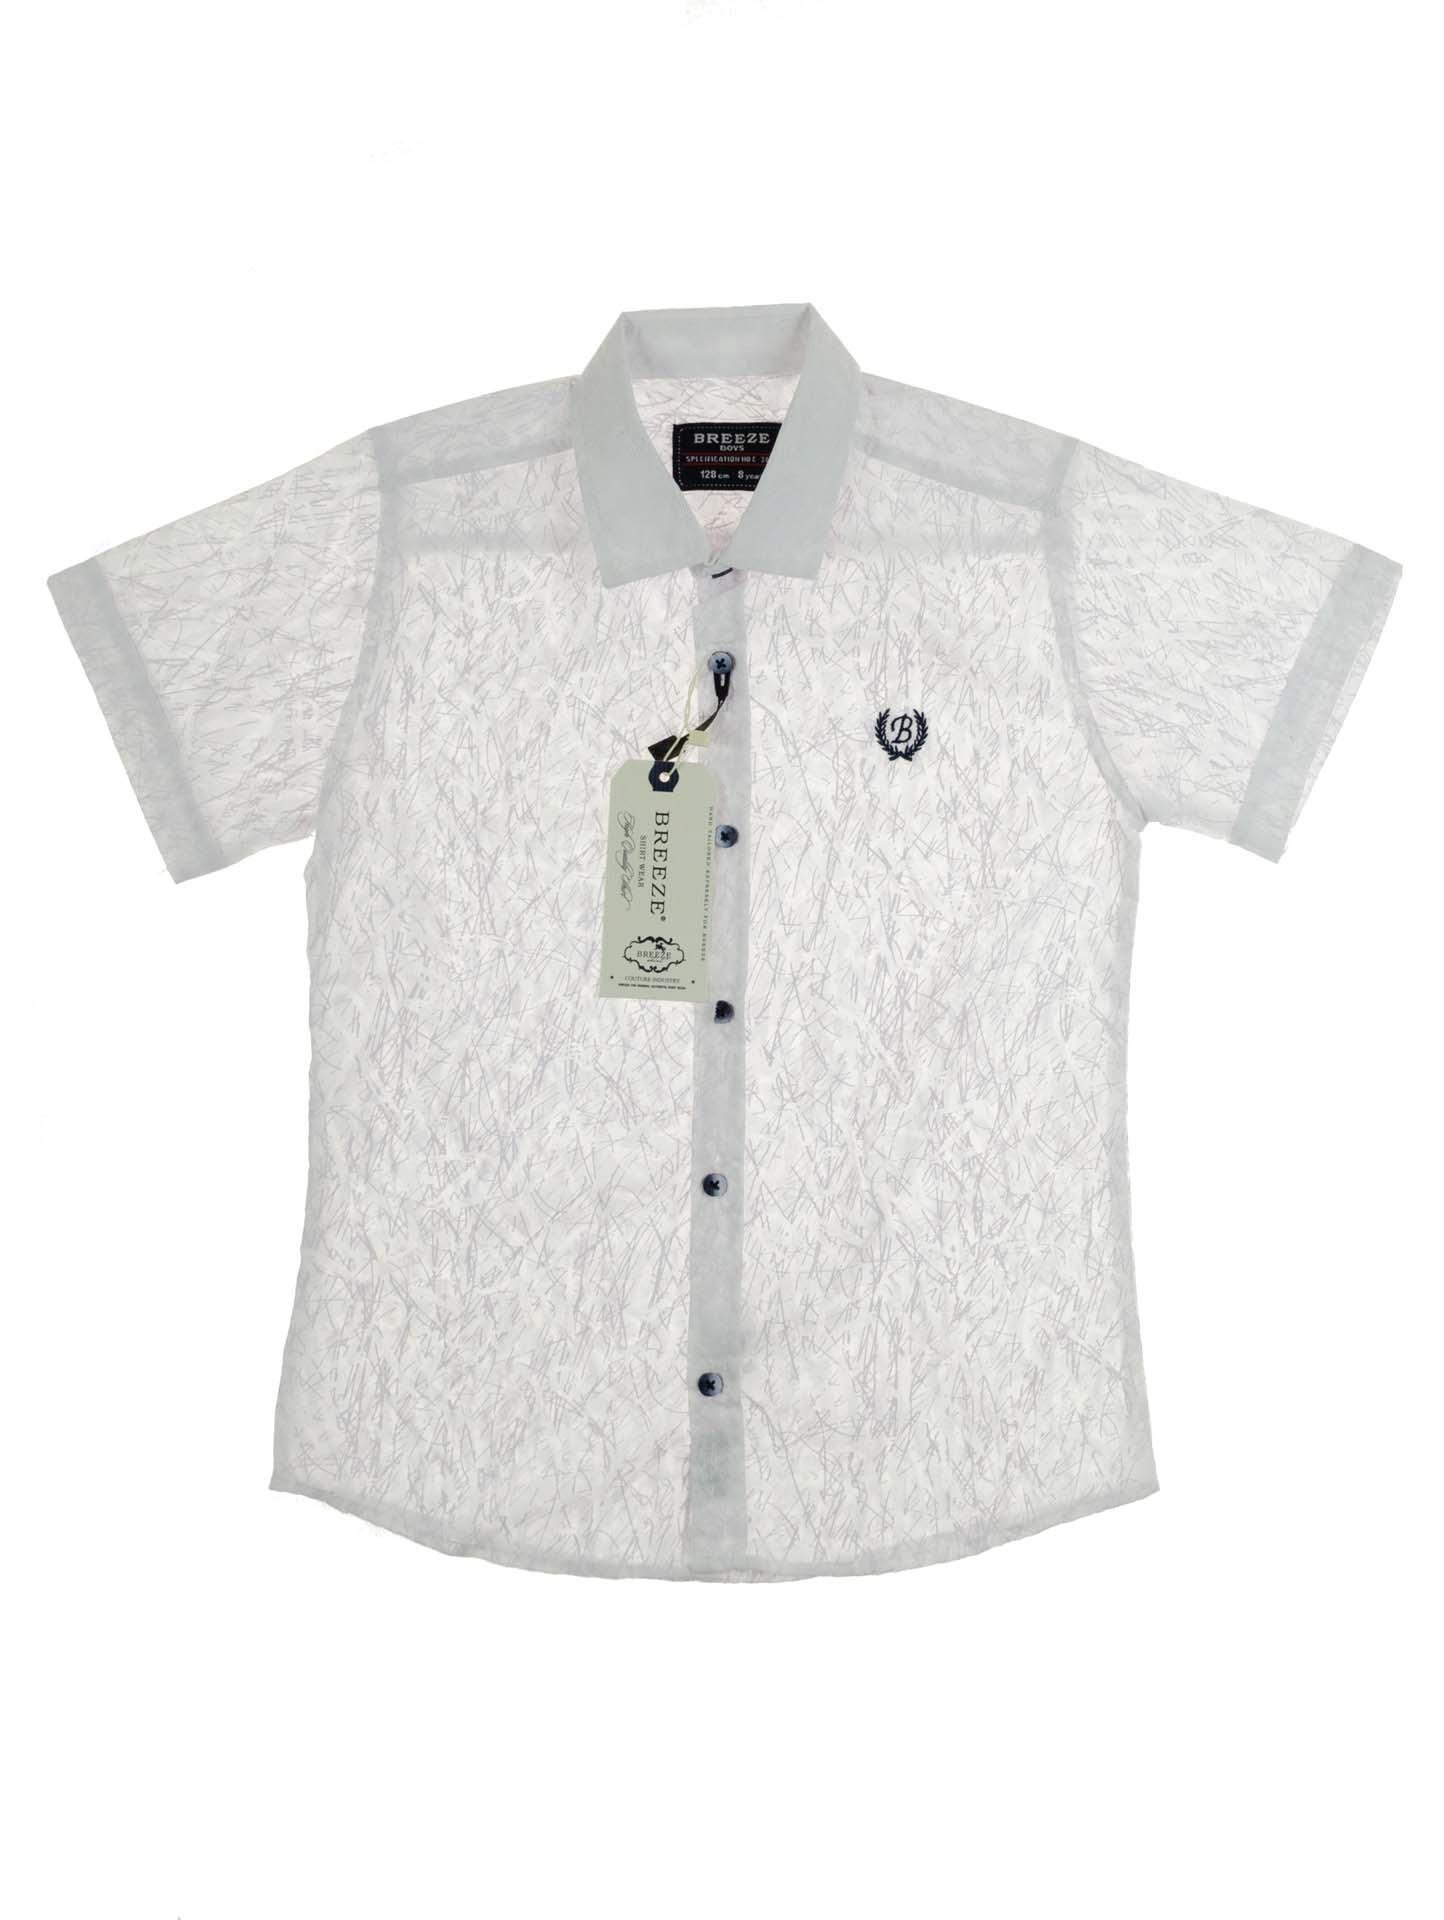 27b7e5d825217 Детская одежда Breeze (E&H), Турция | Top Shelf | Купить детскую ...